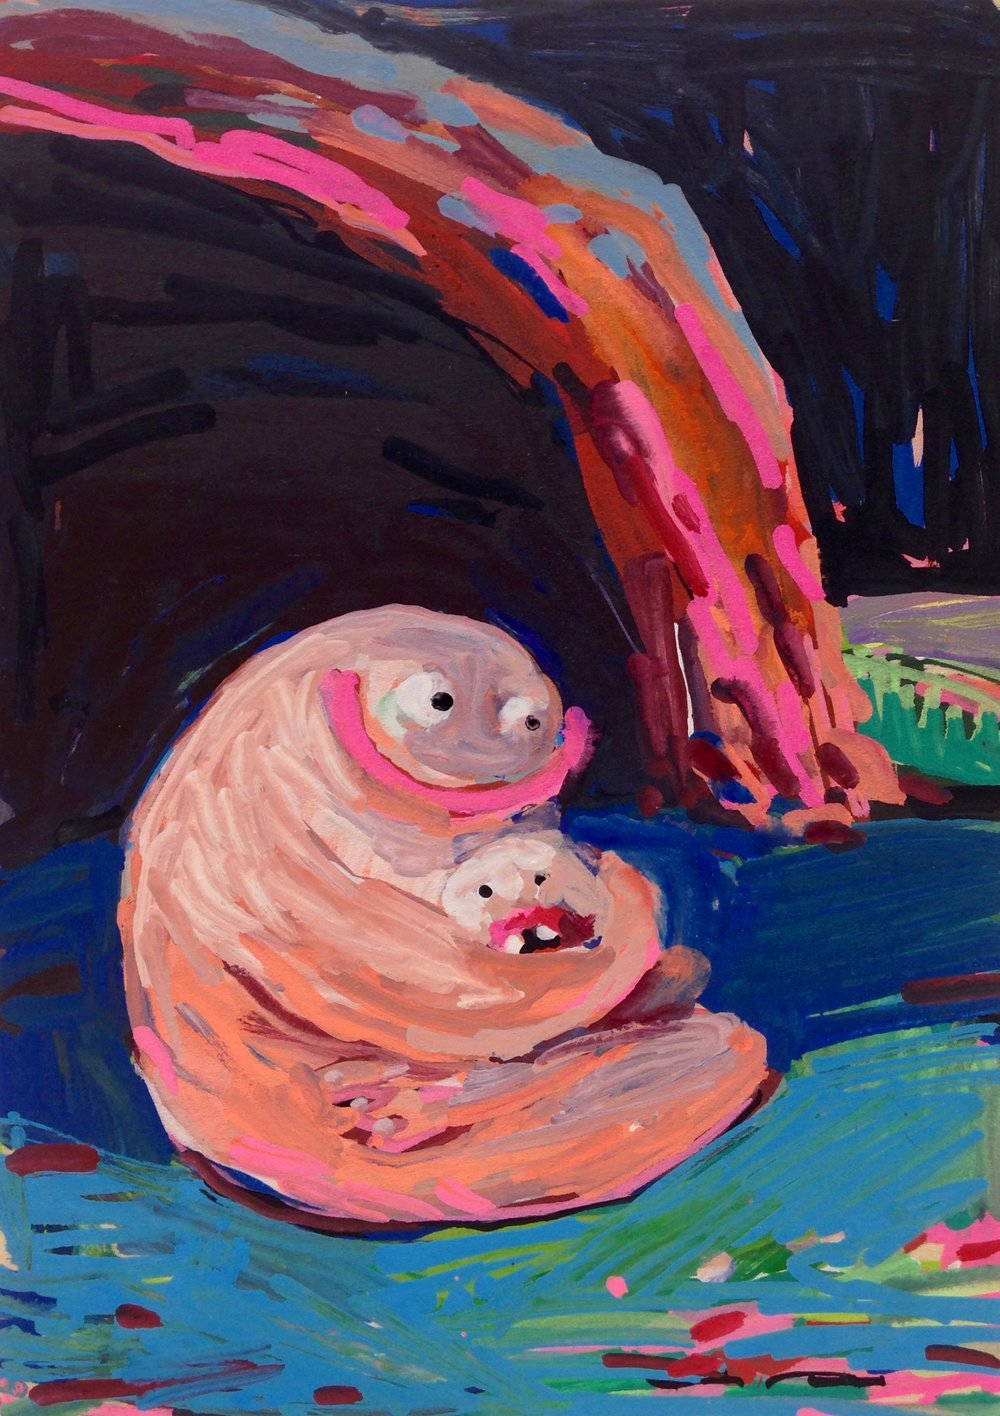 Caveside Hug